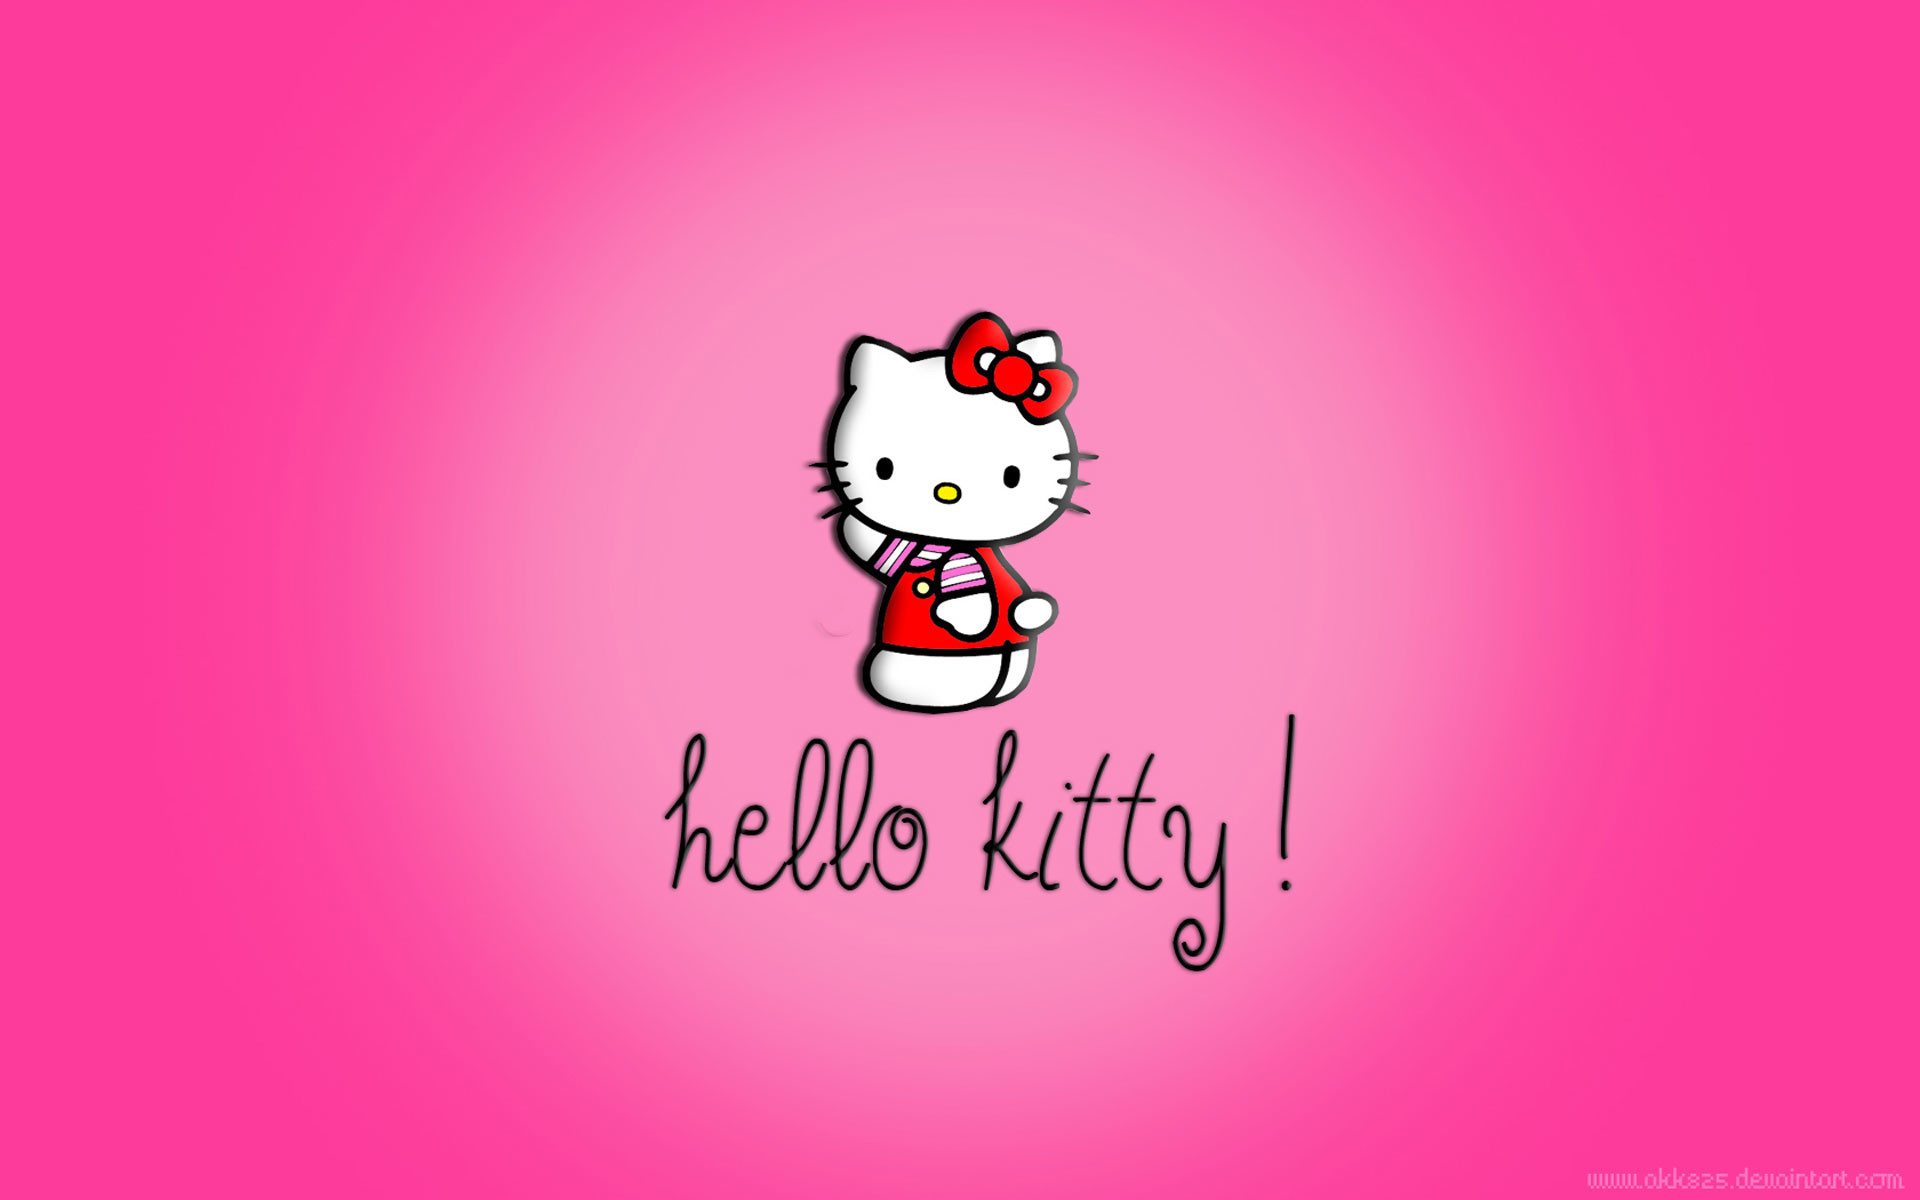 Most Inspiring Wallpaper Hello Kitty Rose Gold - 936608-christmas-hello-kitty-wallpaper-1920x1200-1080p  HD_171685.jpg